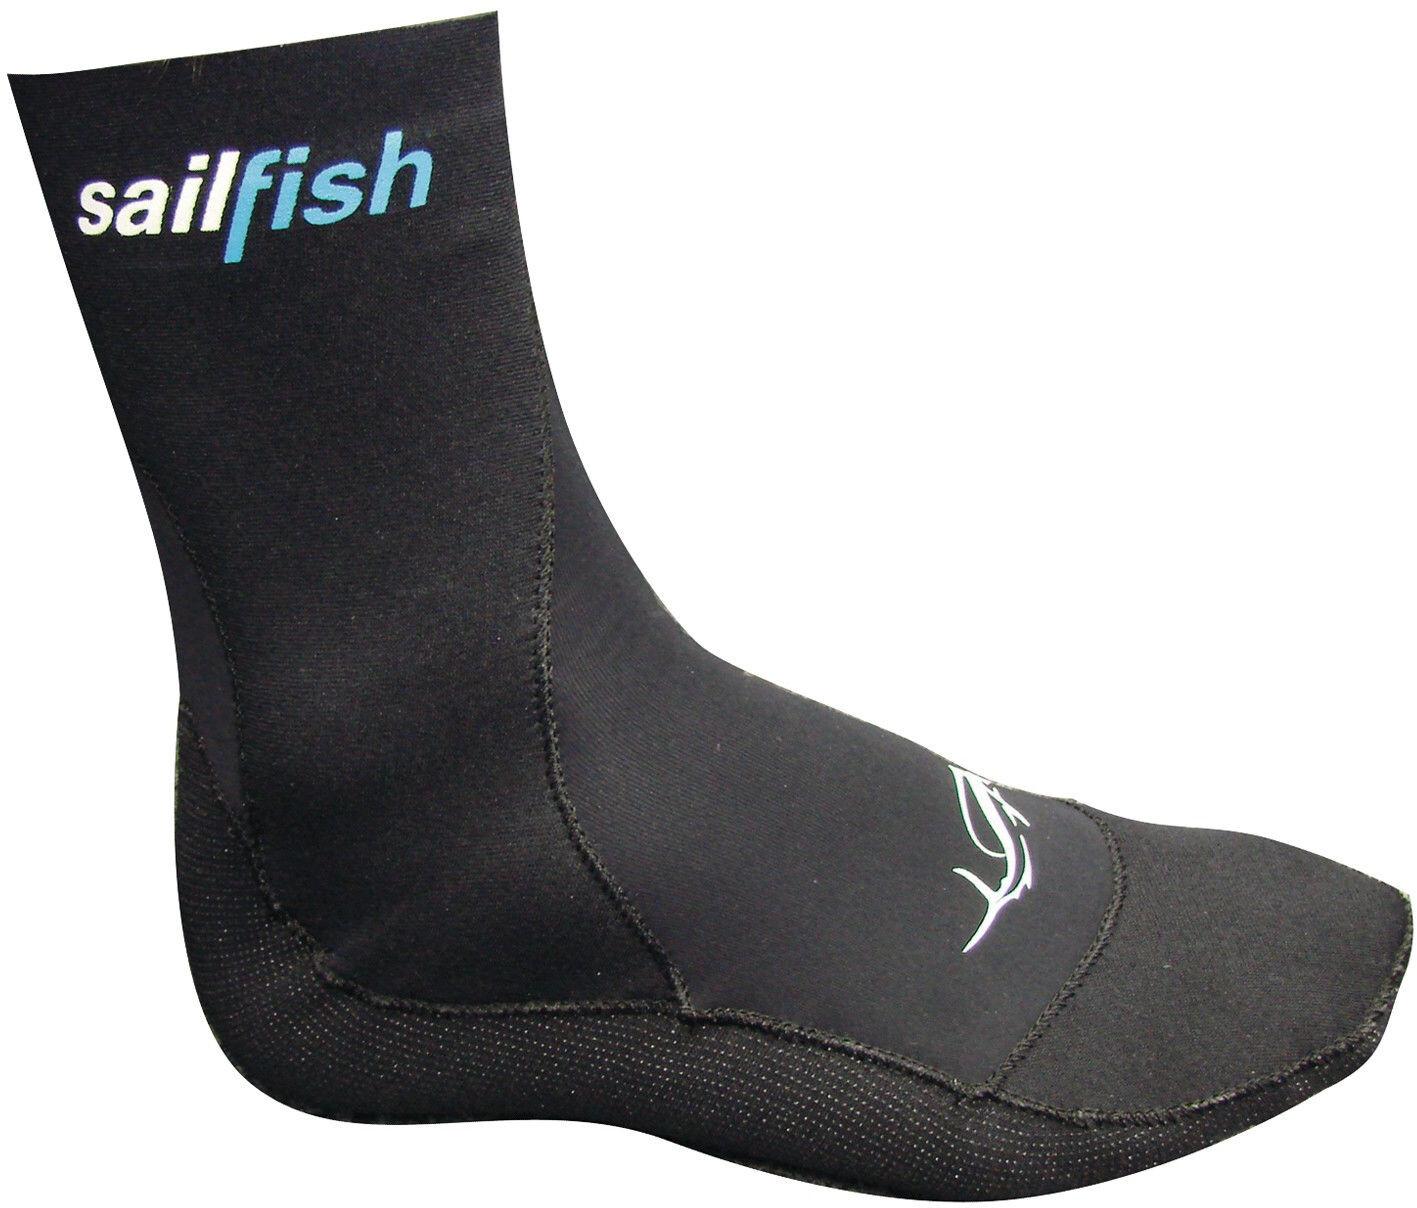 sailfish Neoprene Socks (2019)   Socks